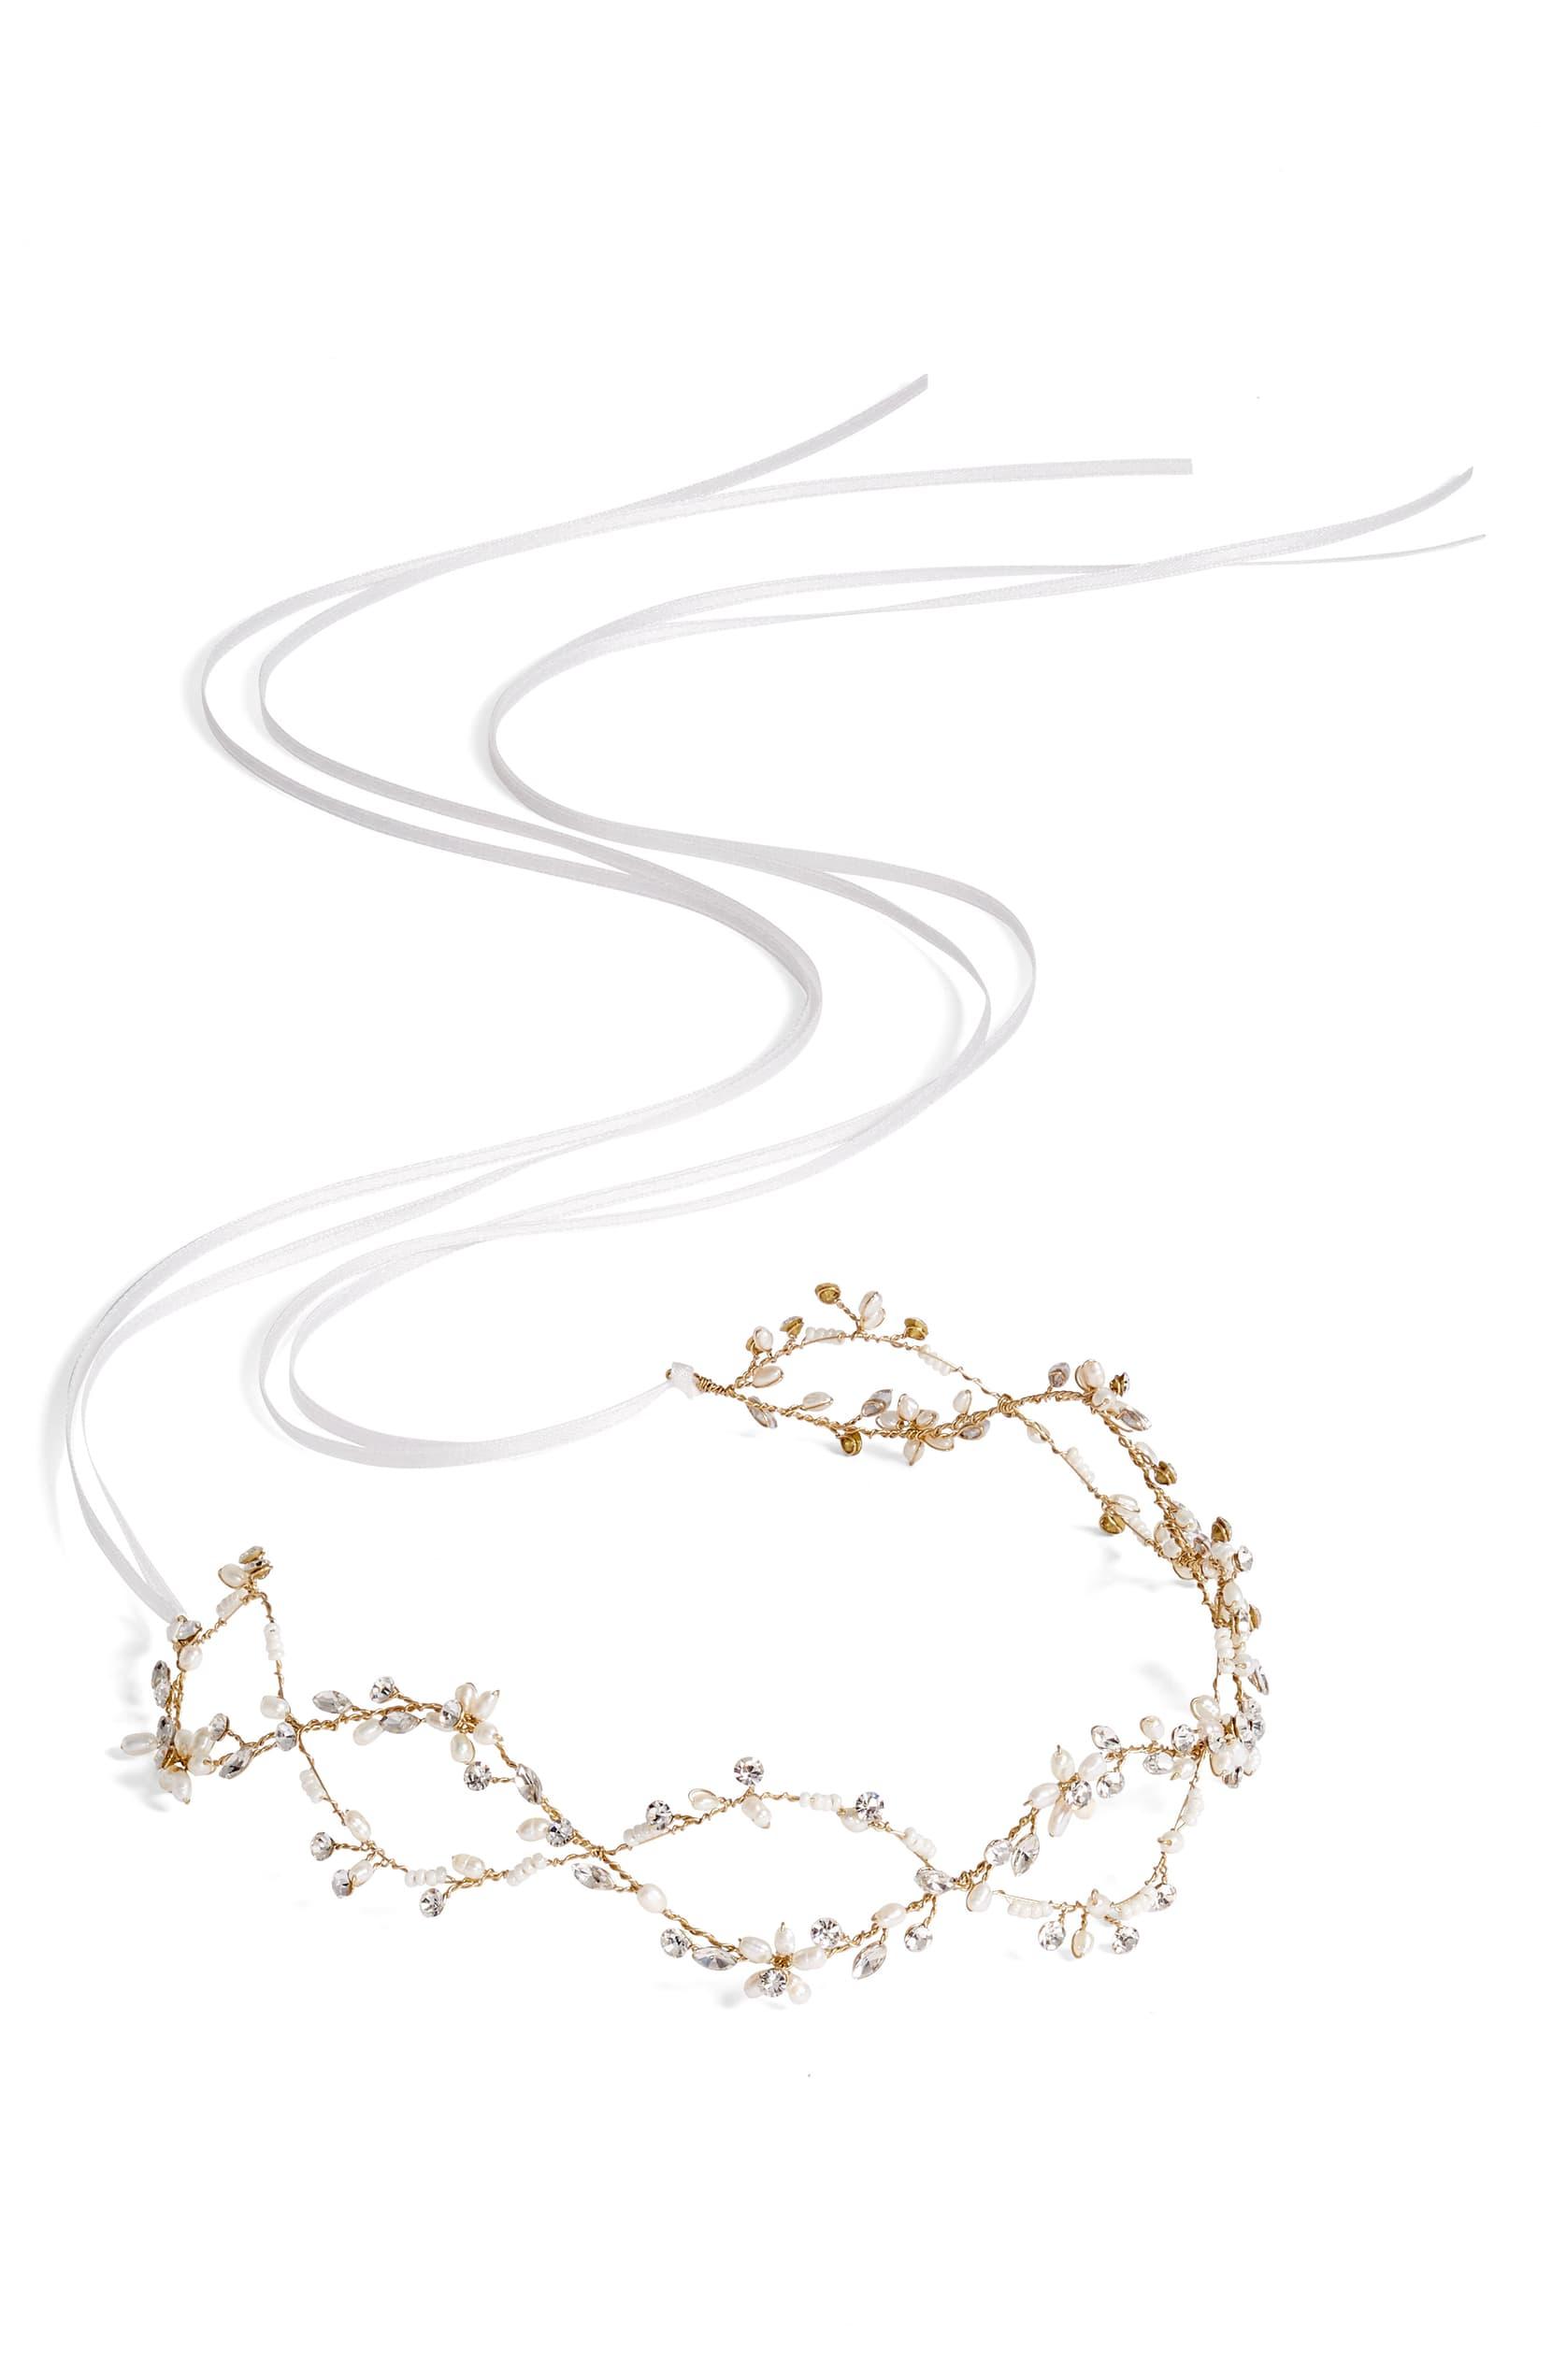 Brides & Hairpins Octavia Pearl Jeweled Halo